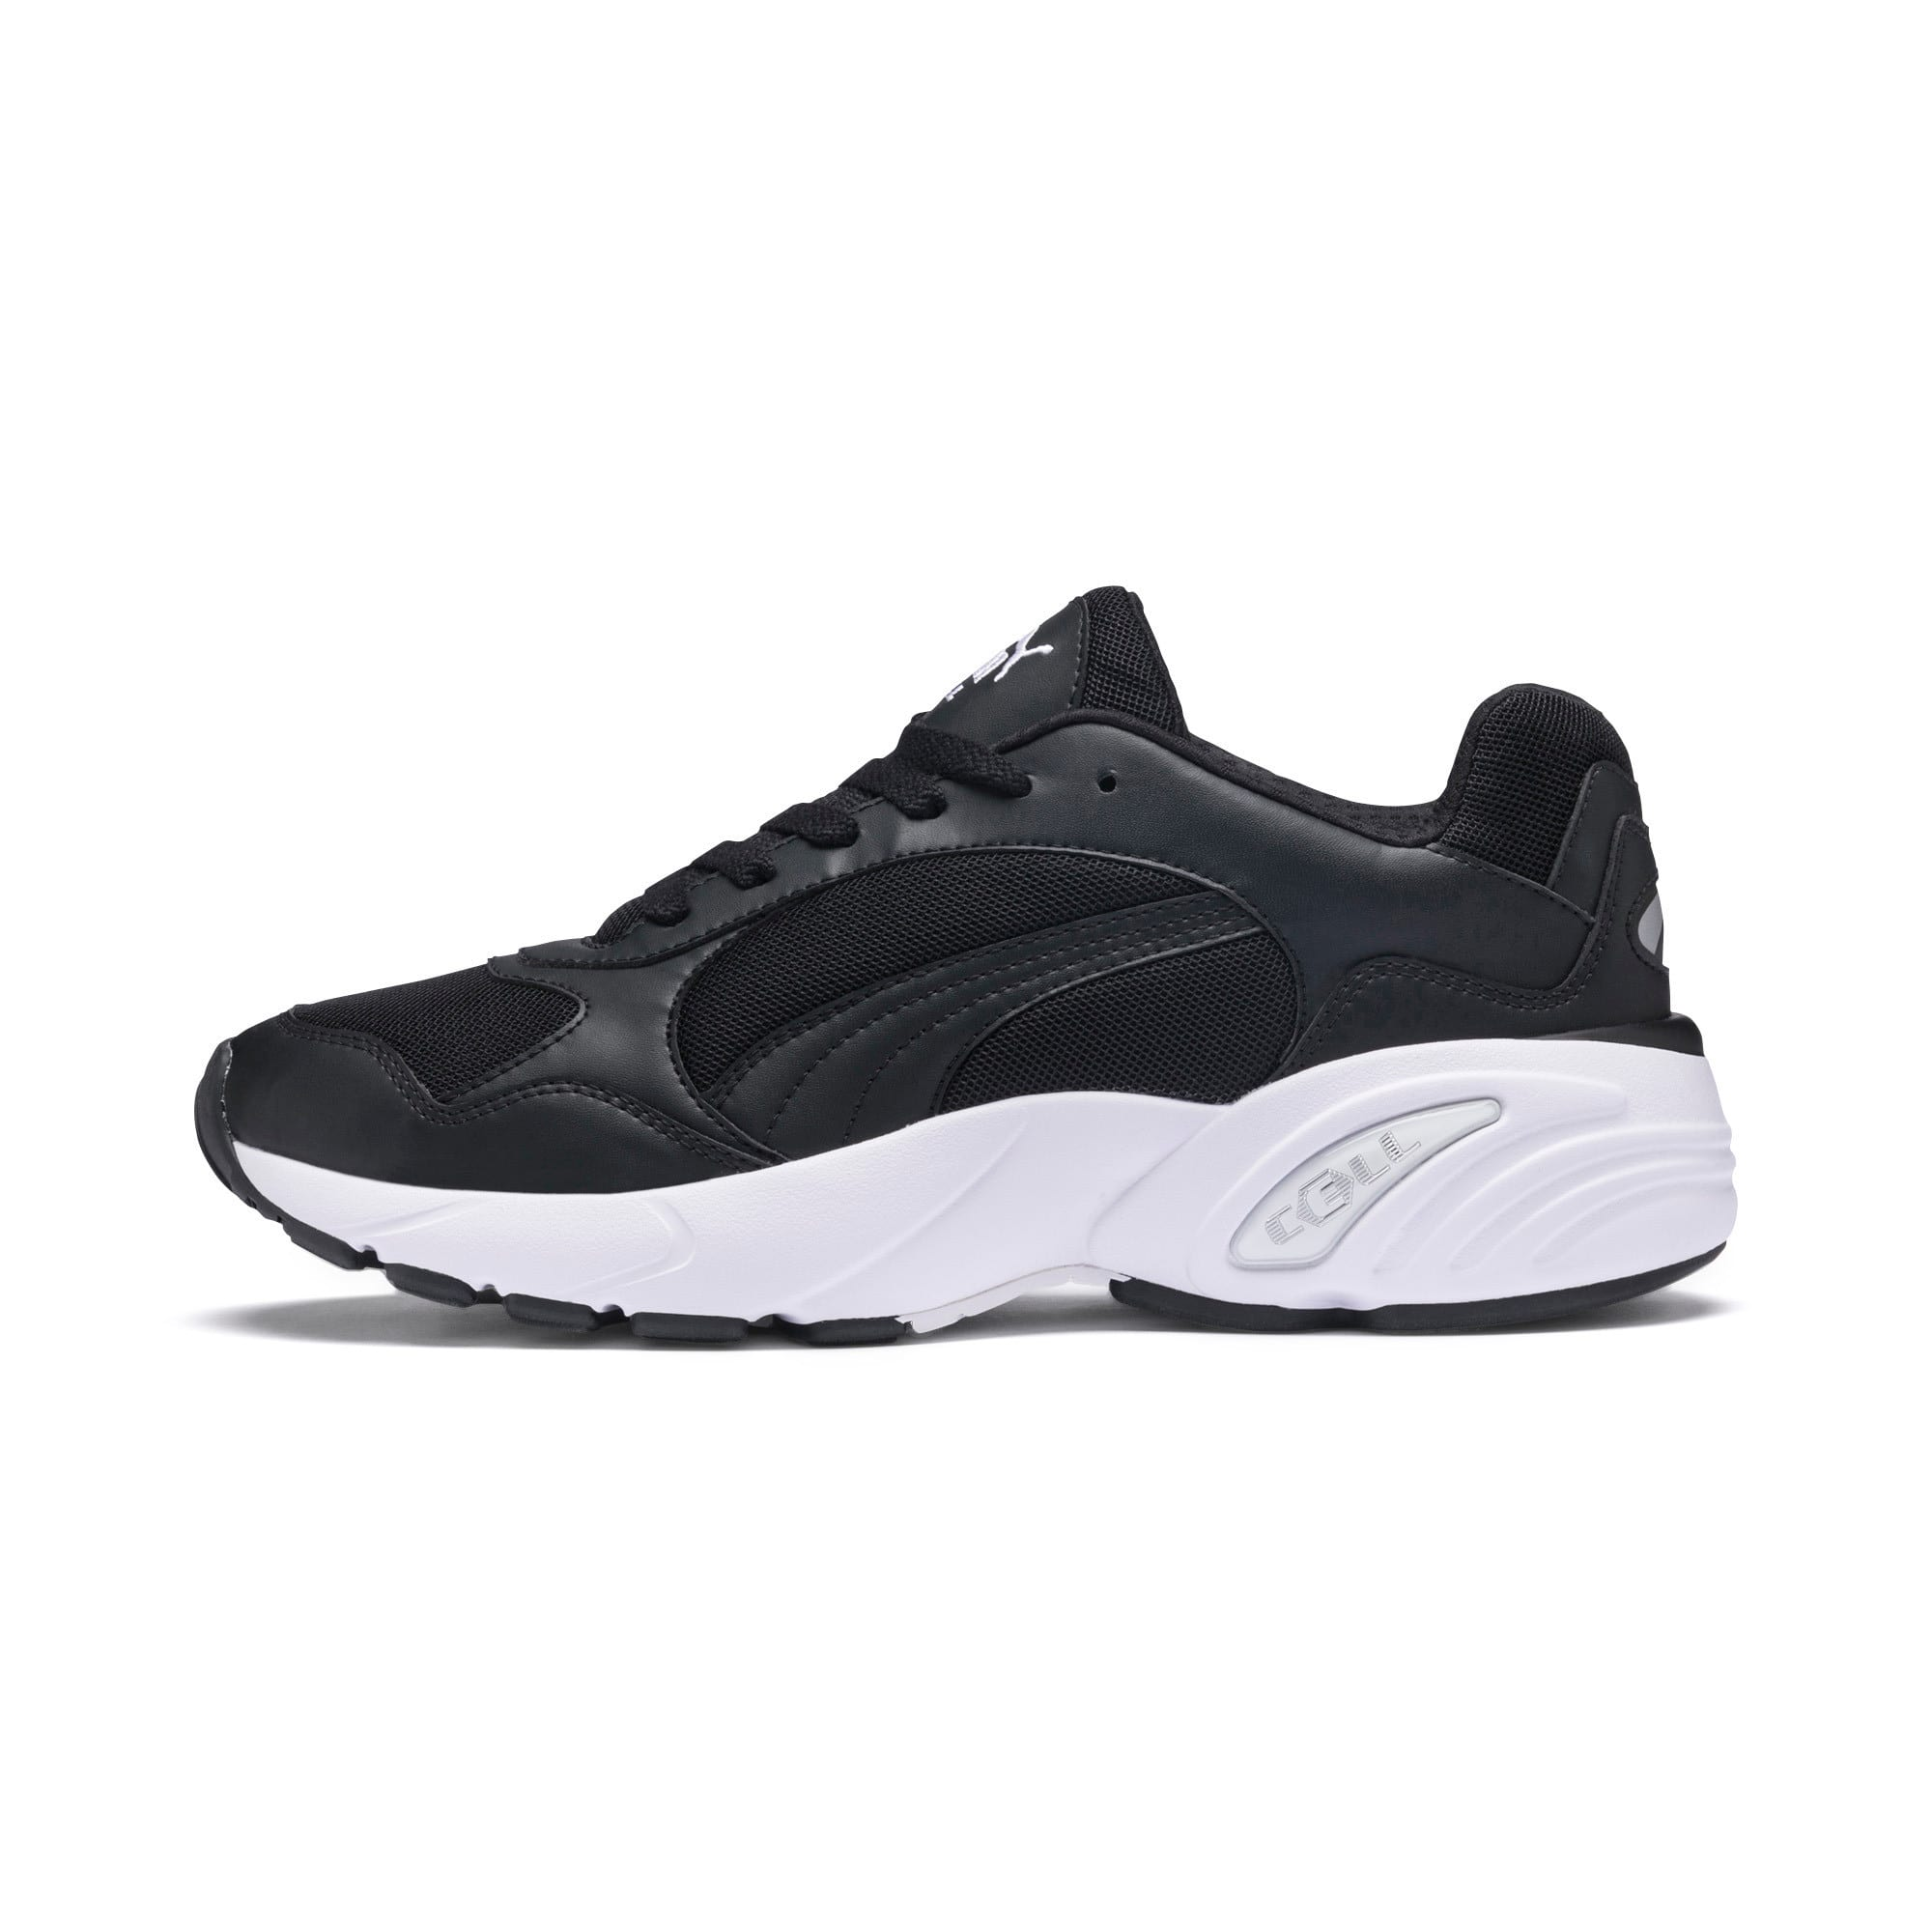 Thumbnail 1 of CELL Viper Sneakers, Puma Black-Puma White, medium